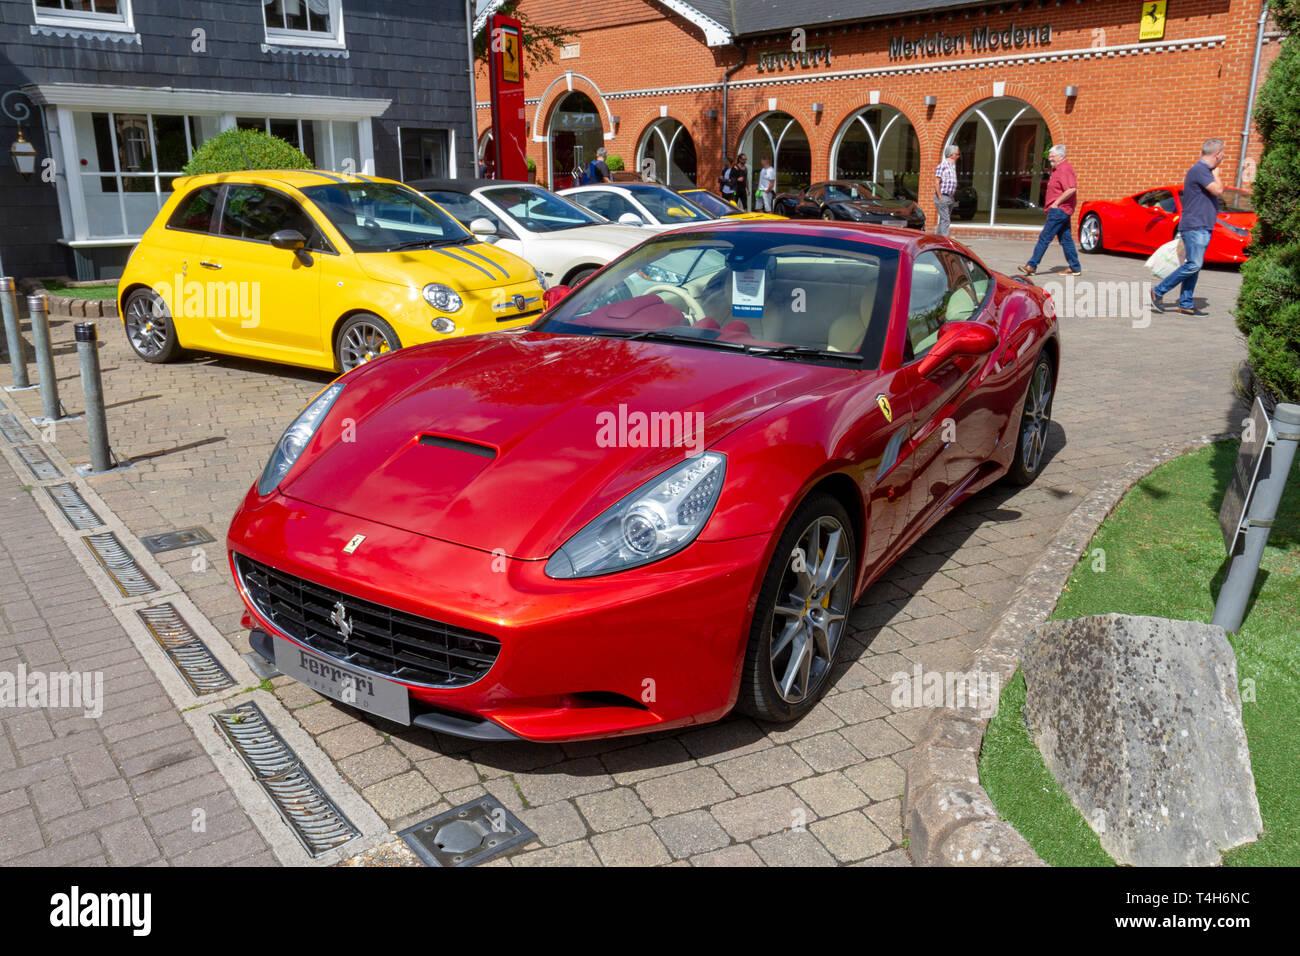 Ferrari Dealership Nc >> Red Ferrari Showroom Stock Photos Red Ferrari Showroom